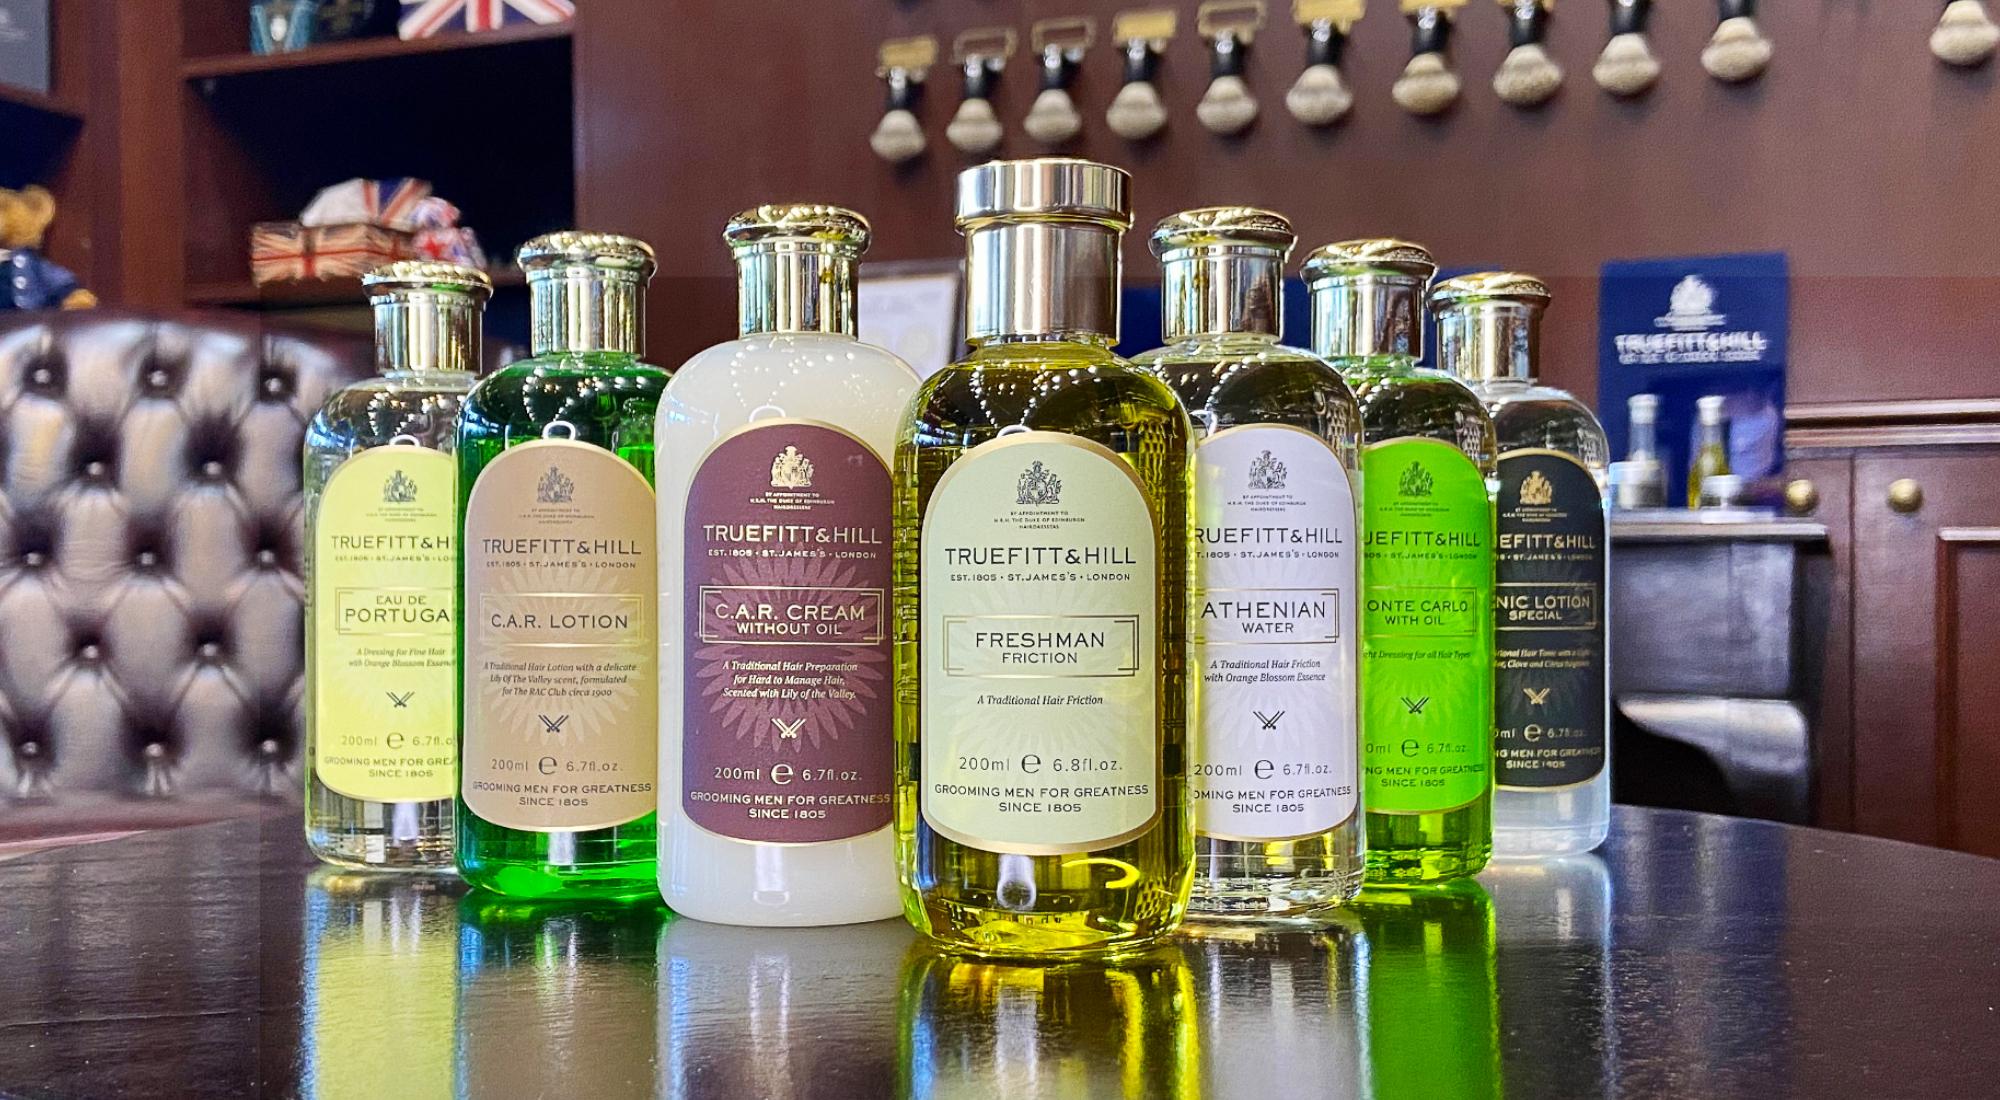 Save on Truefitt & Hill's Range of Quality Hair Tonics